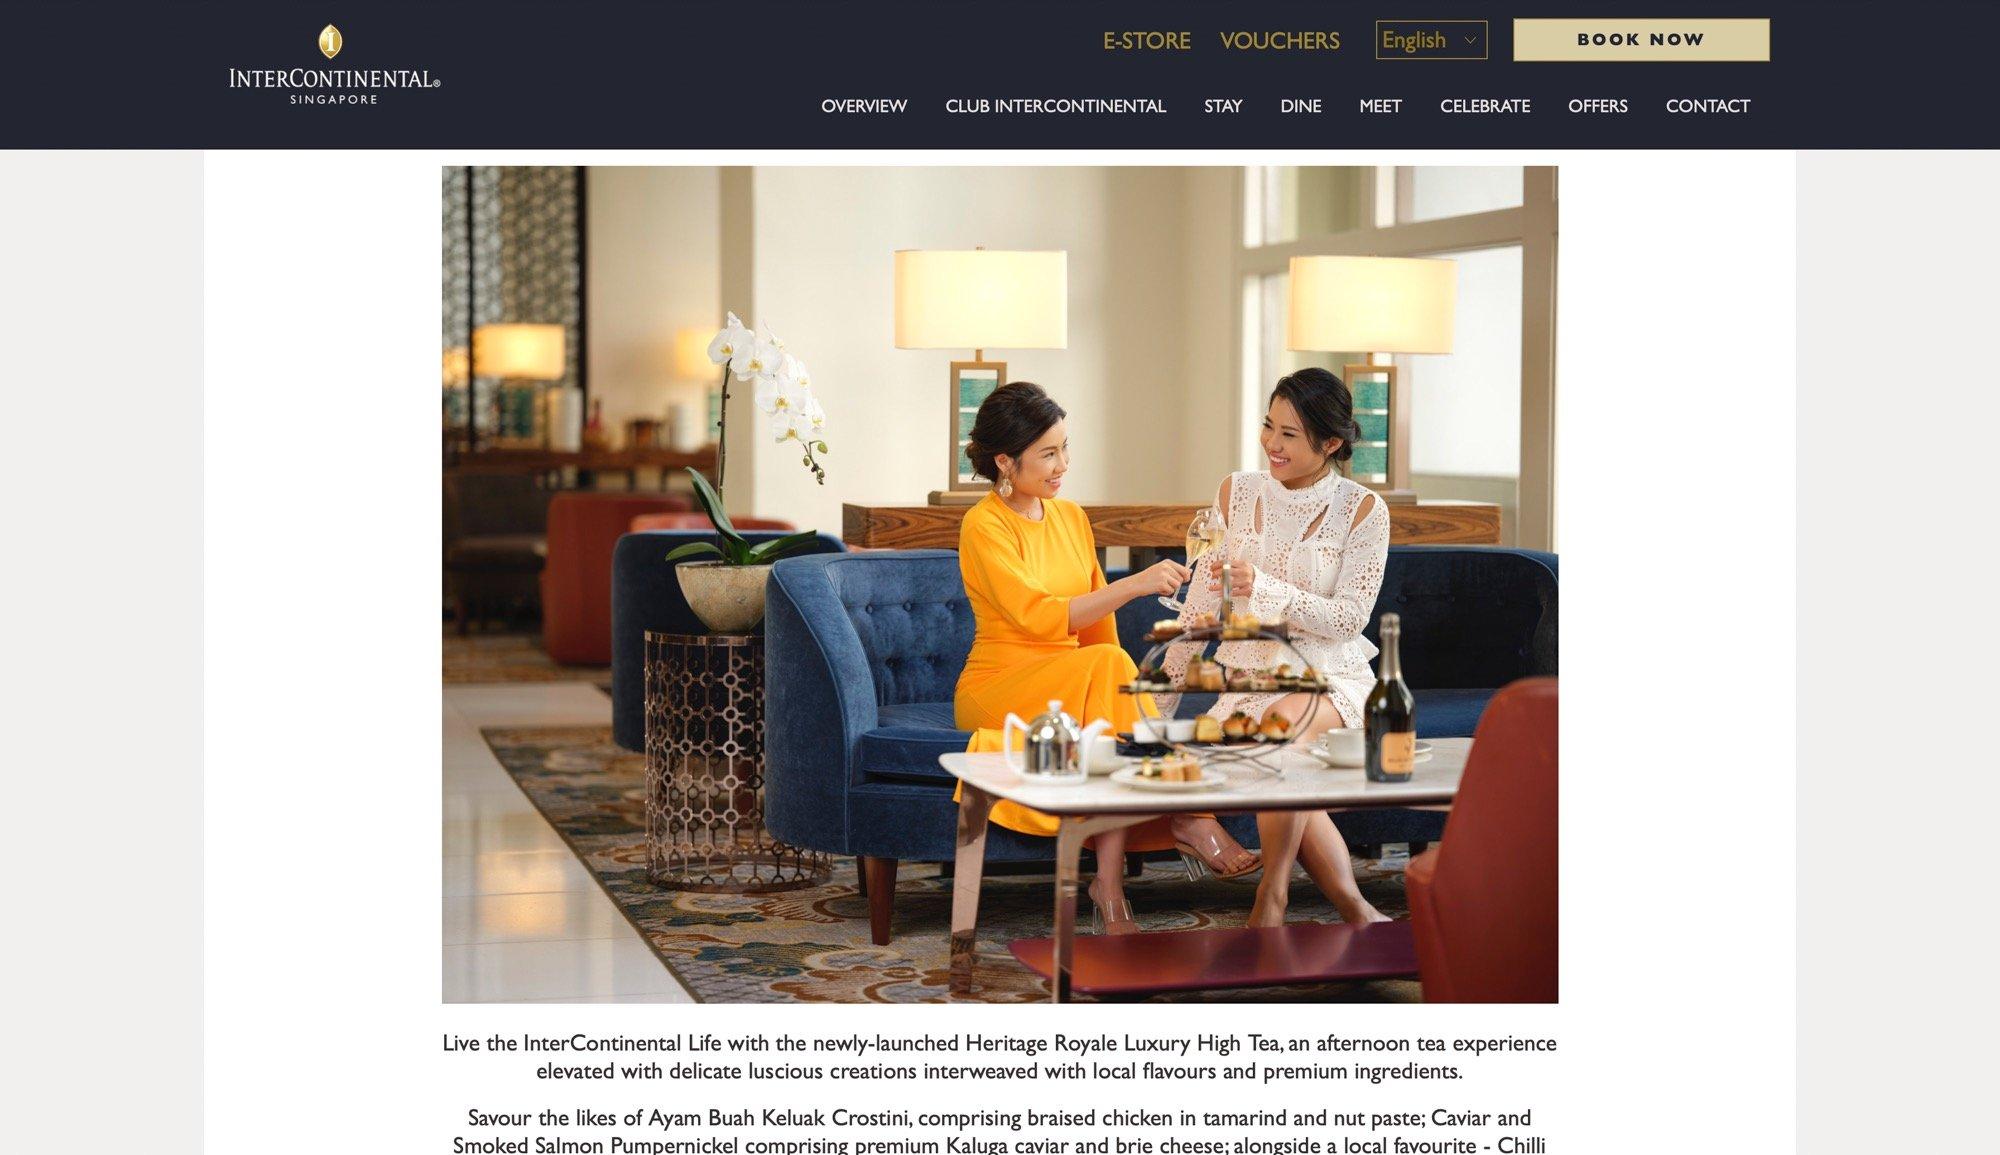 InterContinental Hotel Singapore Media Feature Hospitality Photography Jose Jeuland-14